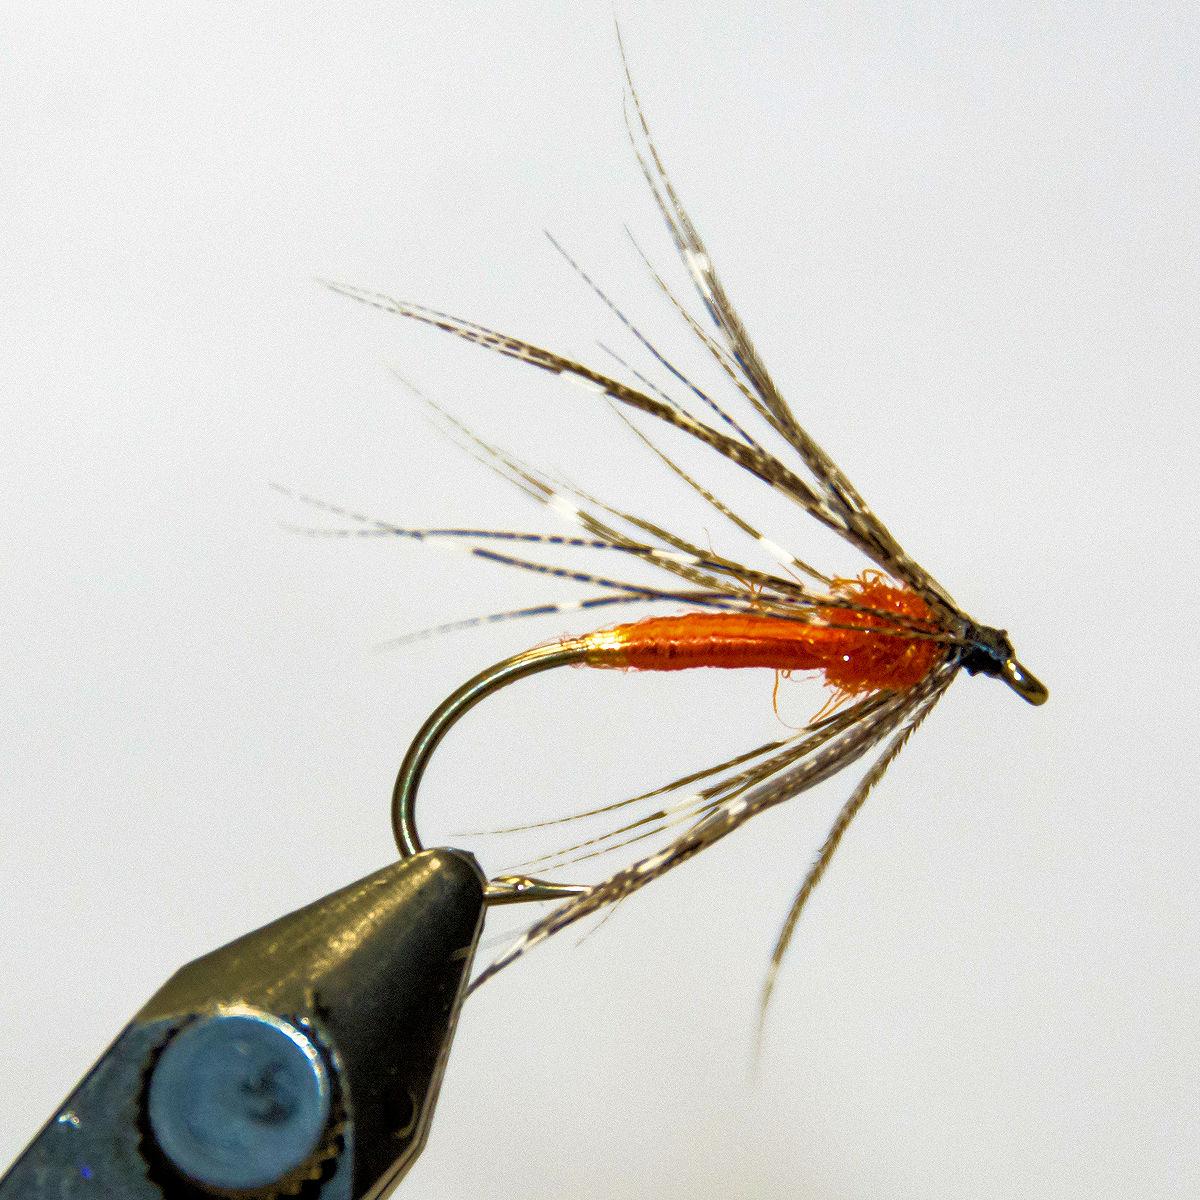 gill-candy-1200.jpg